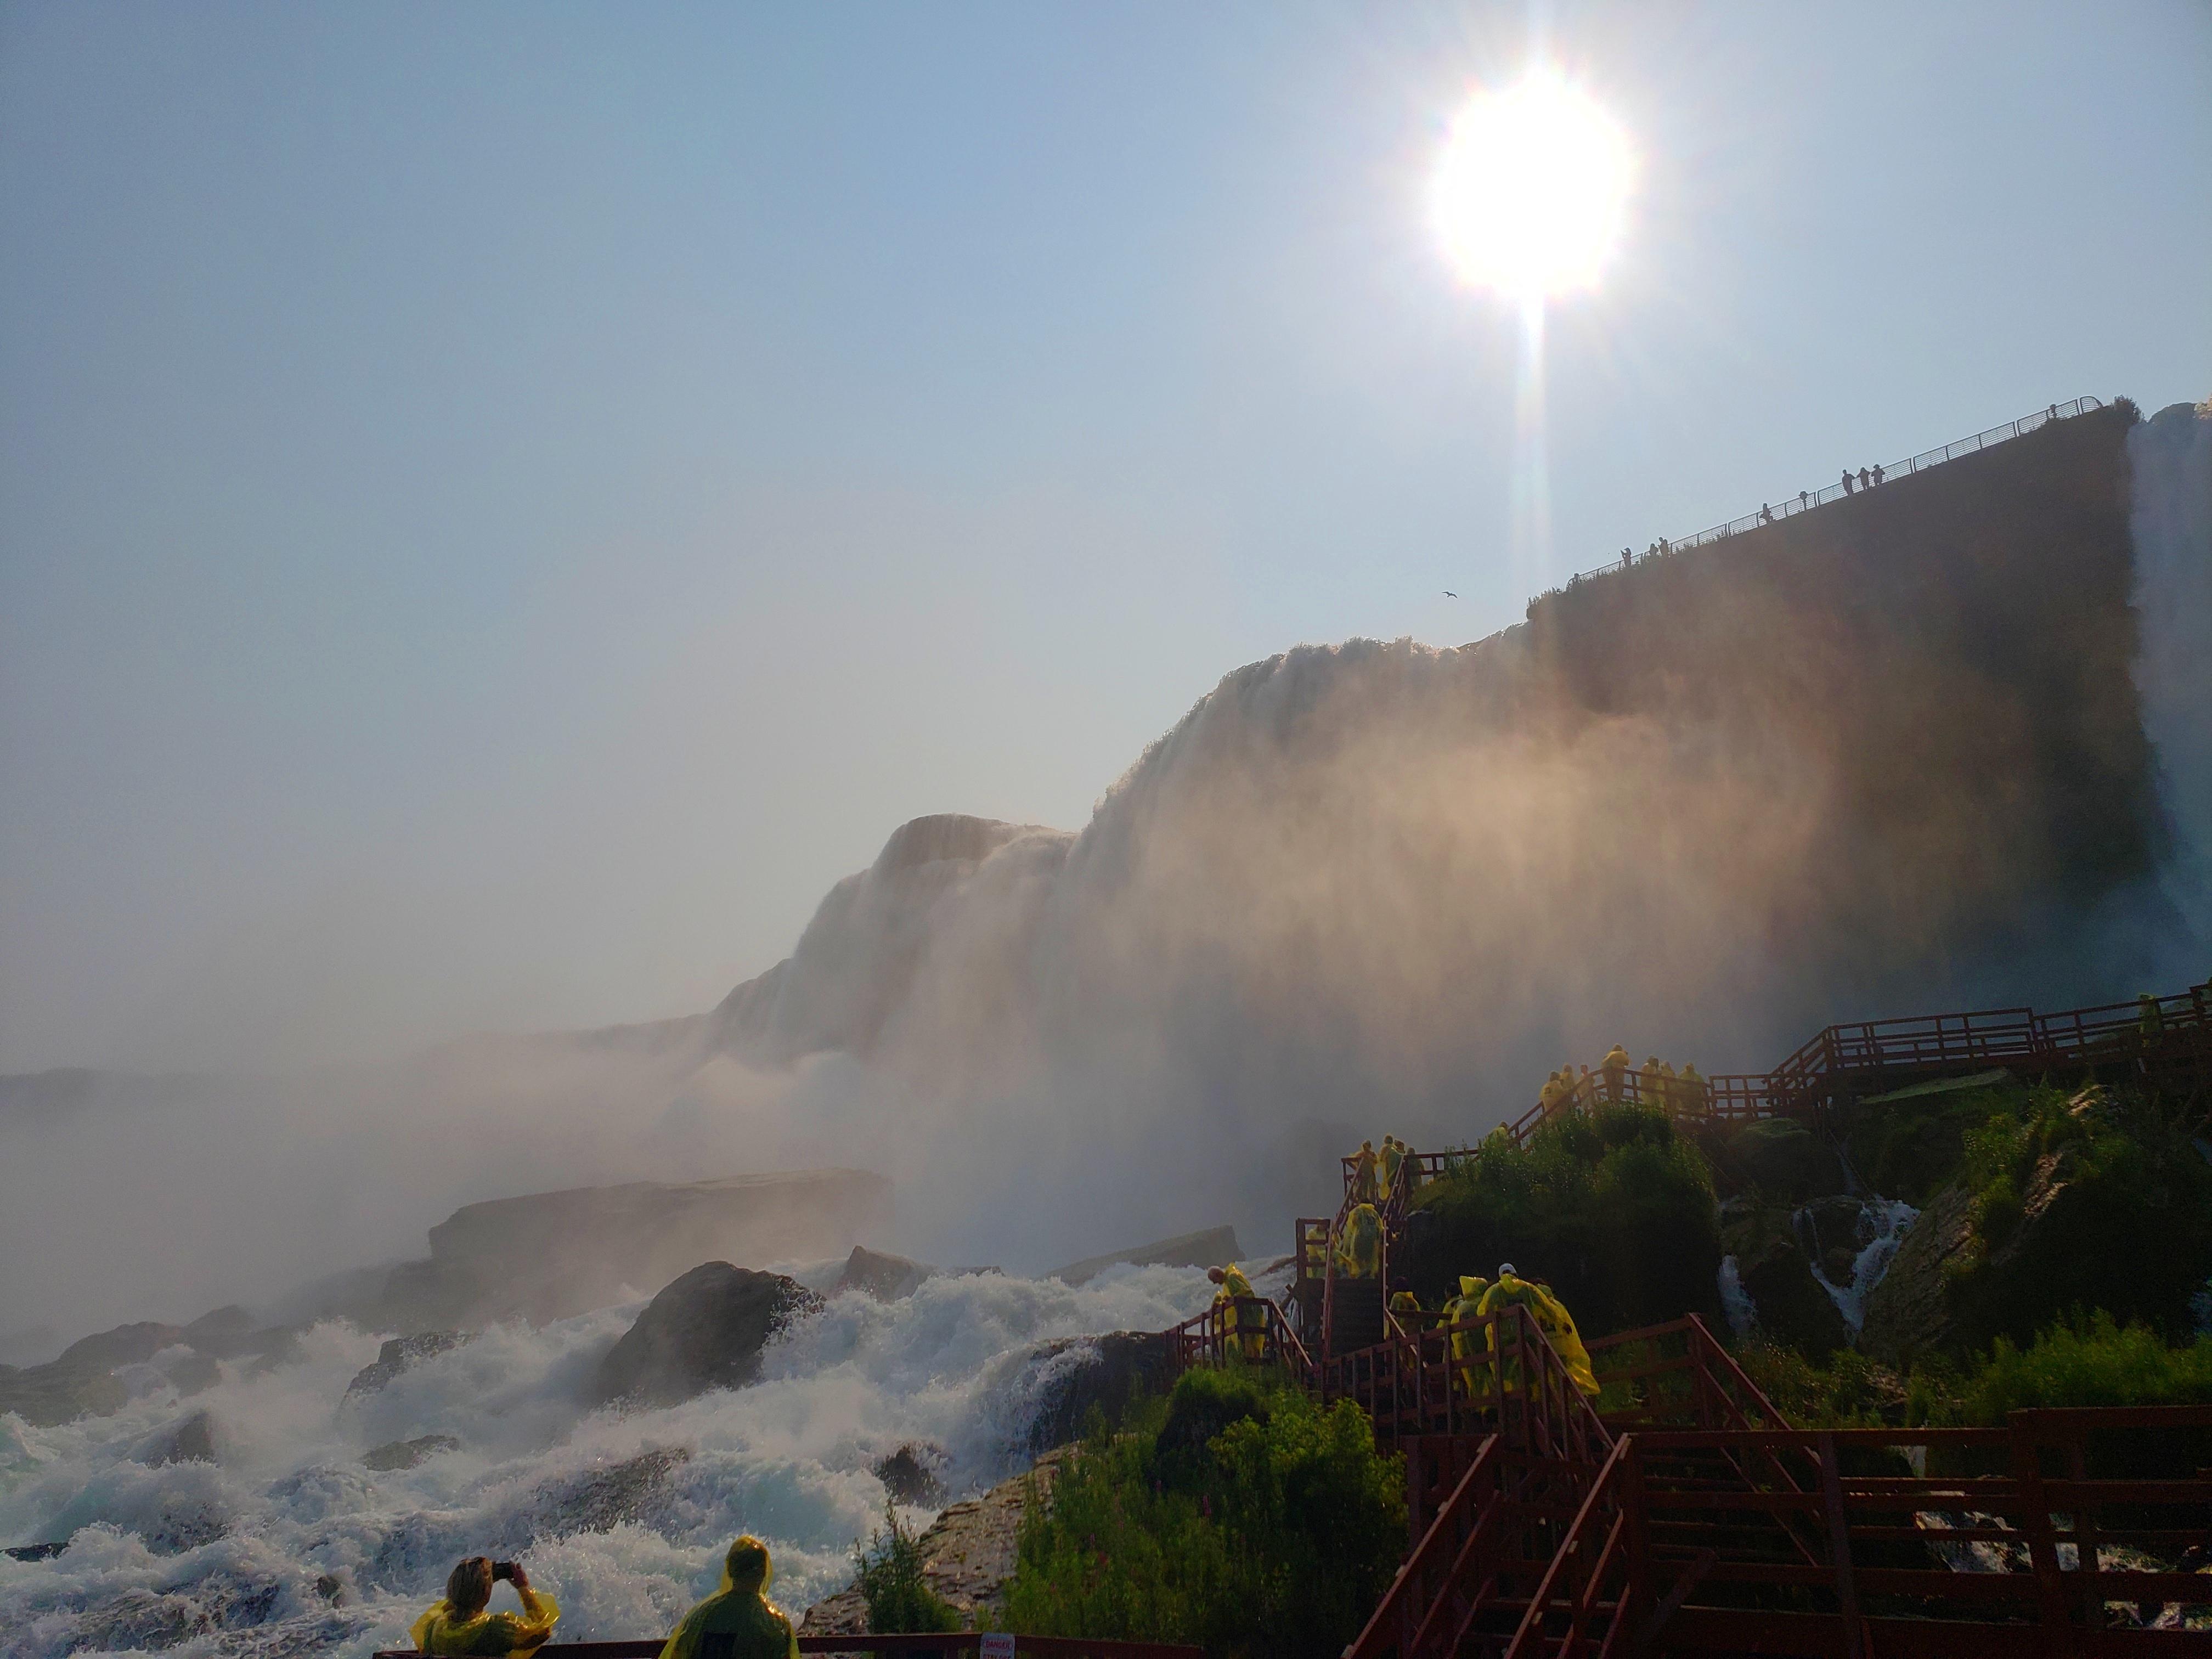 Scenic views of Niagara Falls